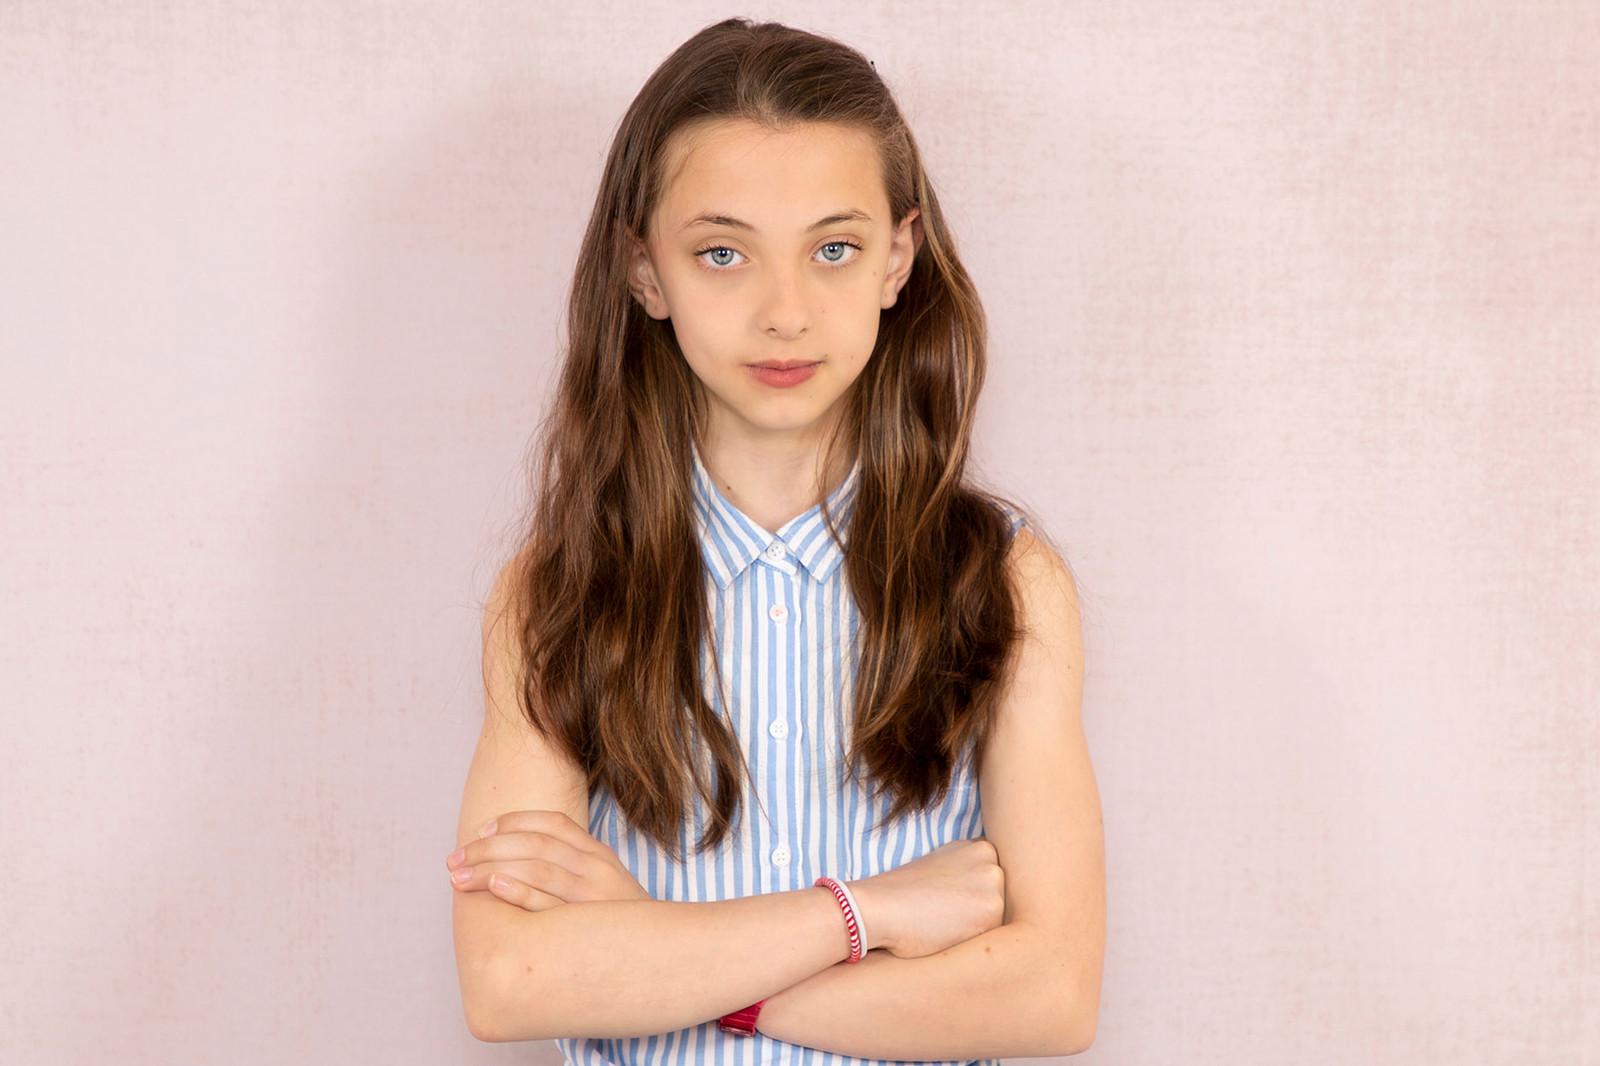 Child model portfolio photoshoot gemerations photography